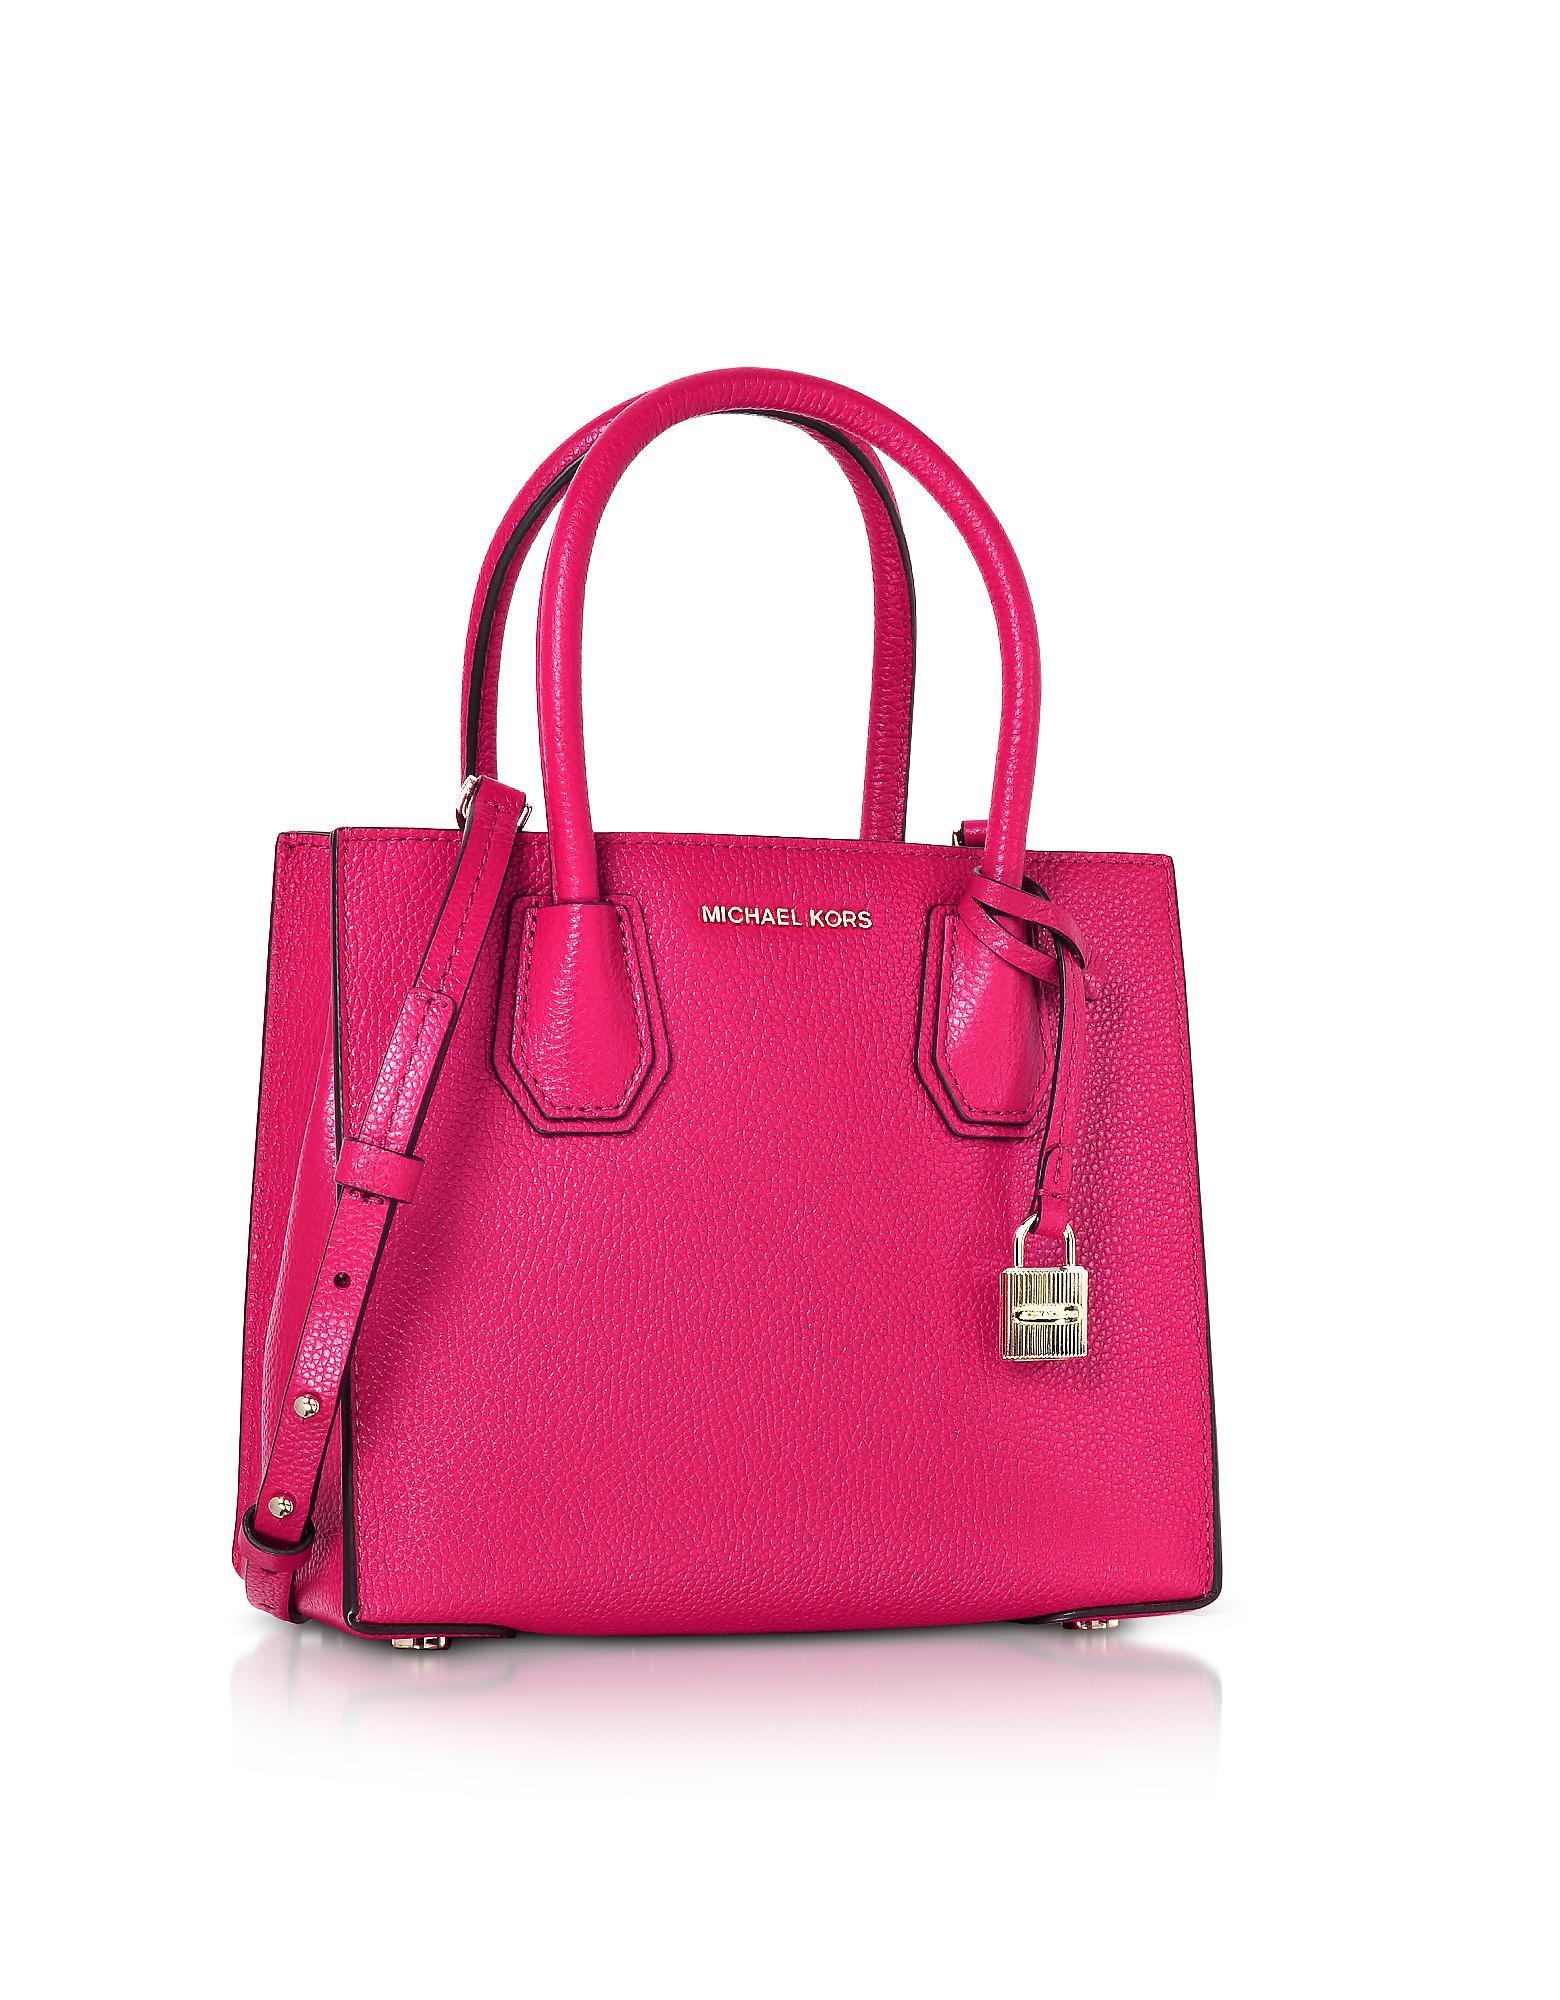 Michael Kors Mercer Leather Crossbody Bag In Pink Lyst Satchel Authentic